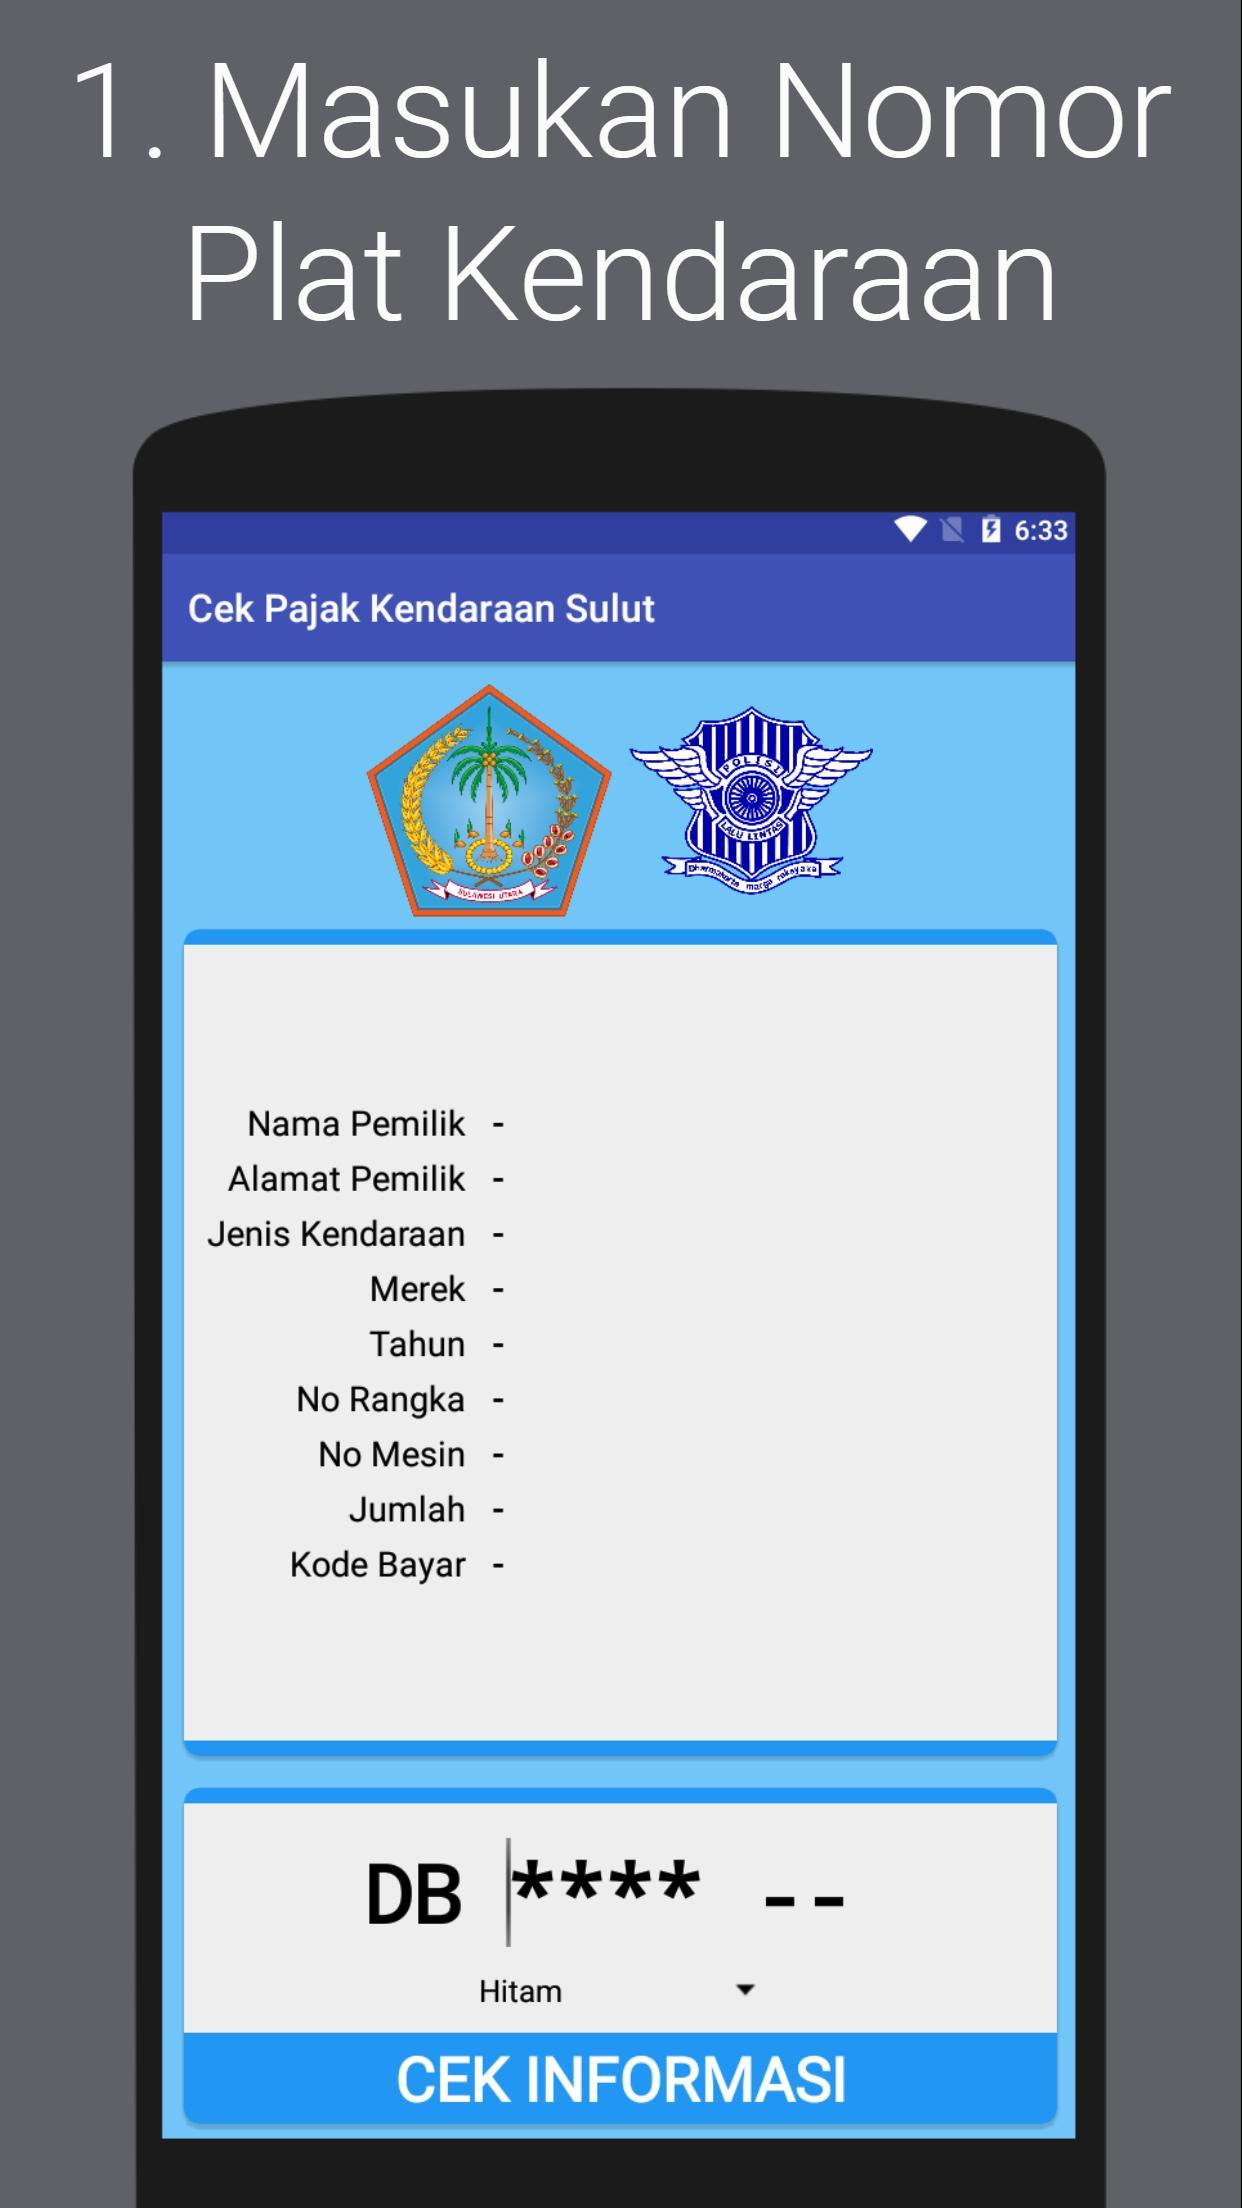 Cek Pajak Kendaraan Sulawesi Utara Online For Android Apk Download